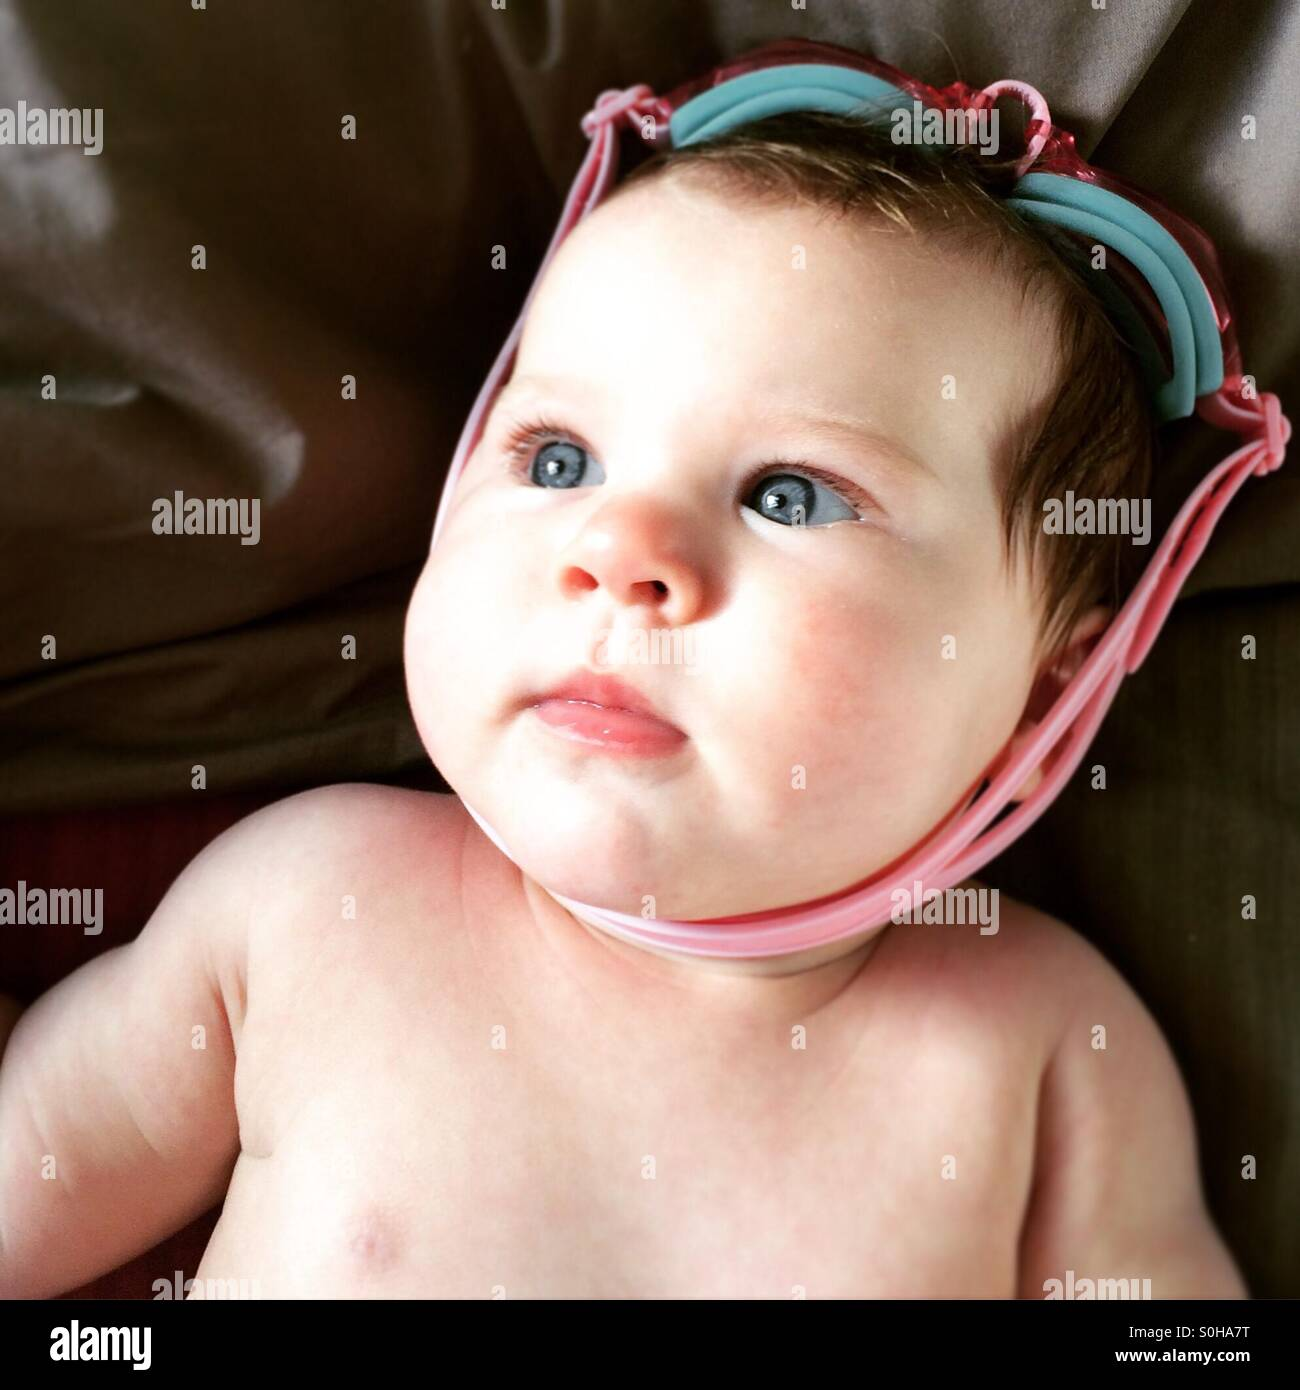 Baby swim lessons - Stock Image